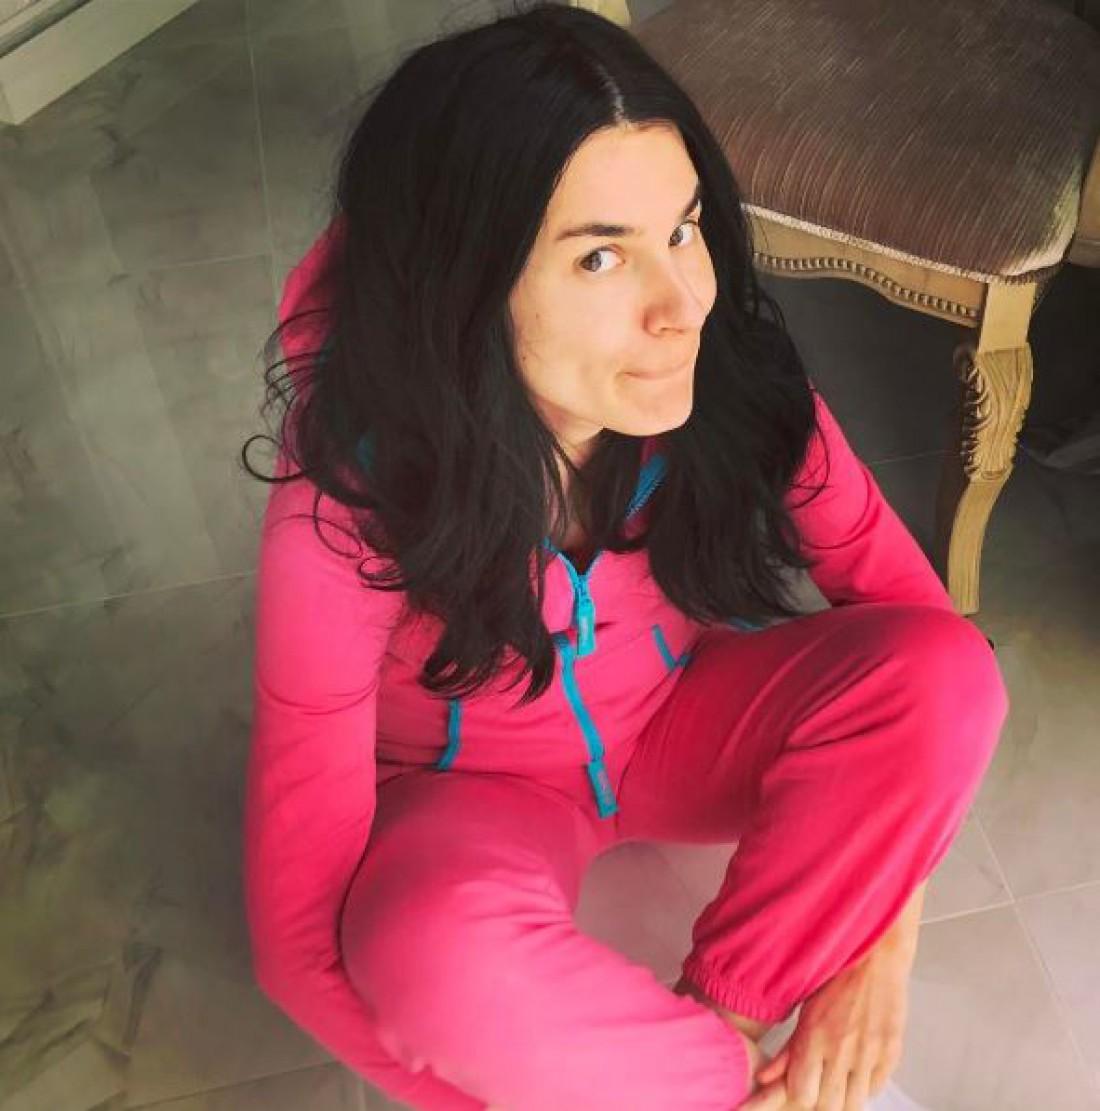 Маша Ефросинина в спортивном костюме